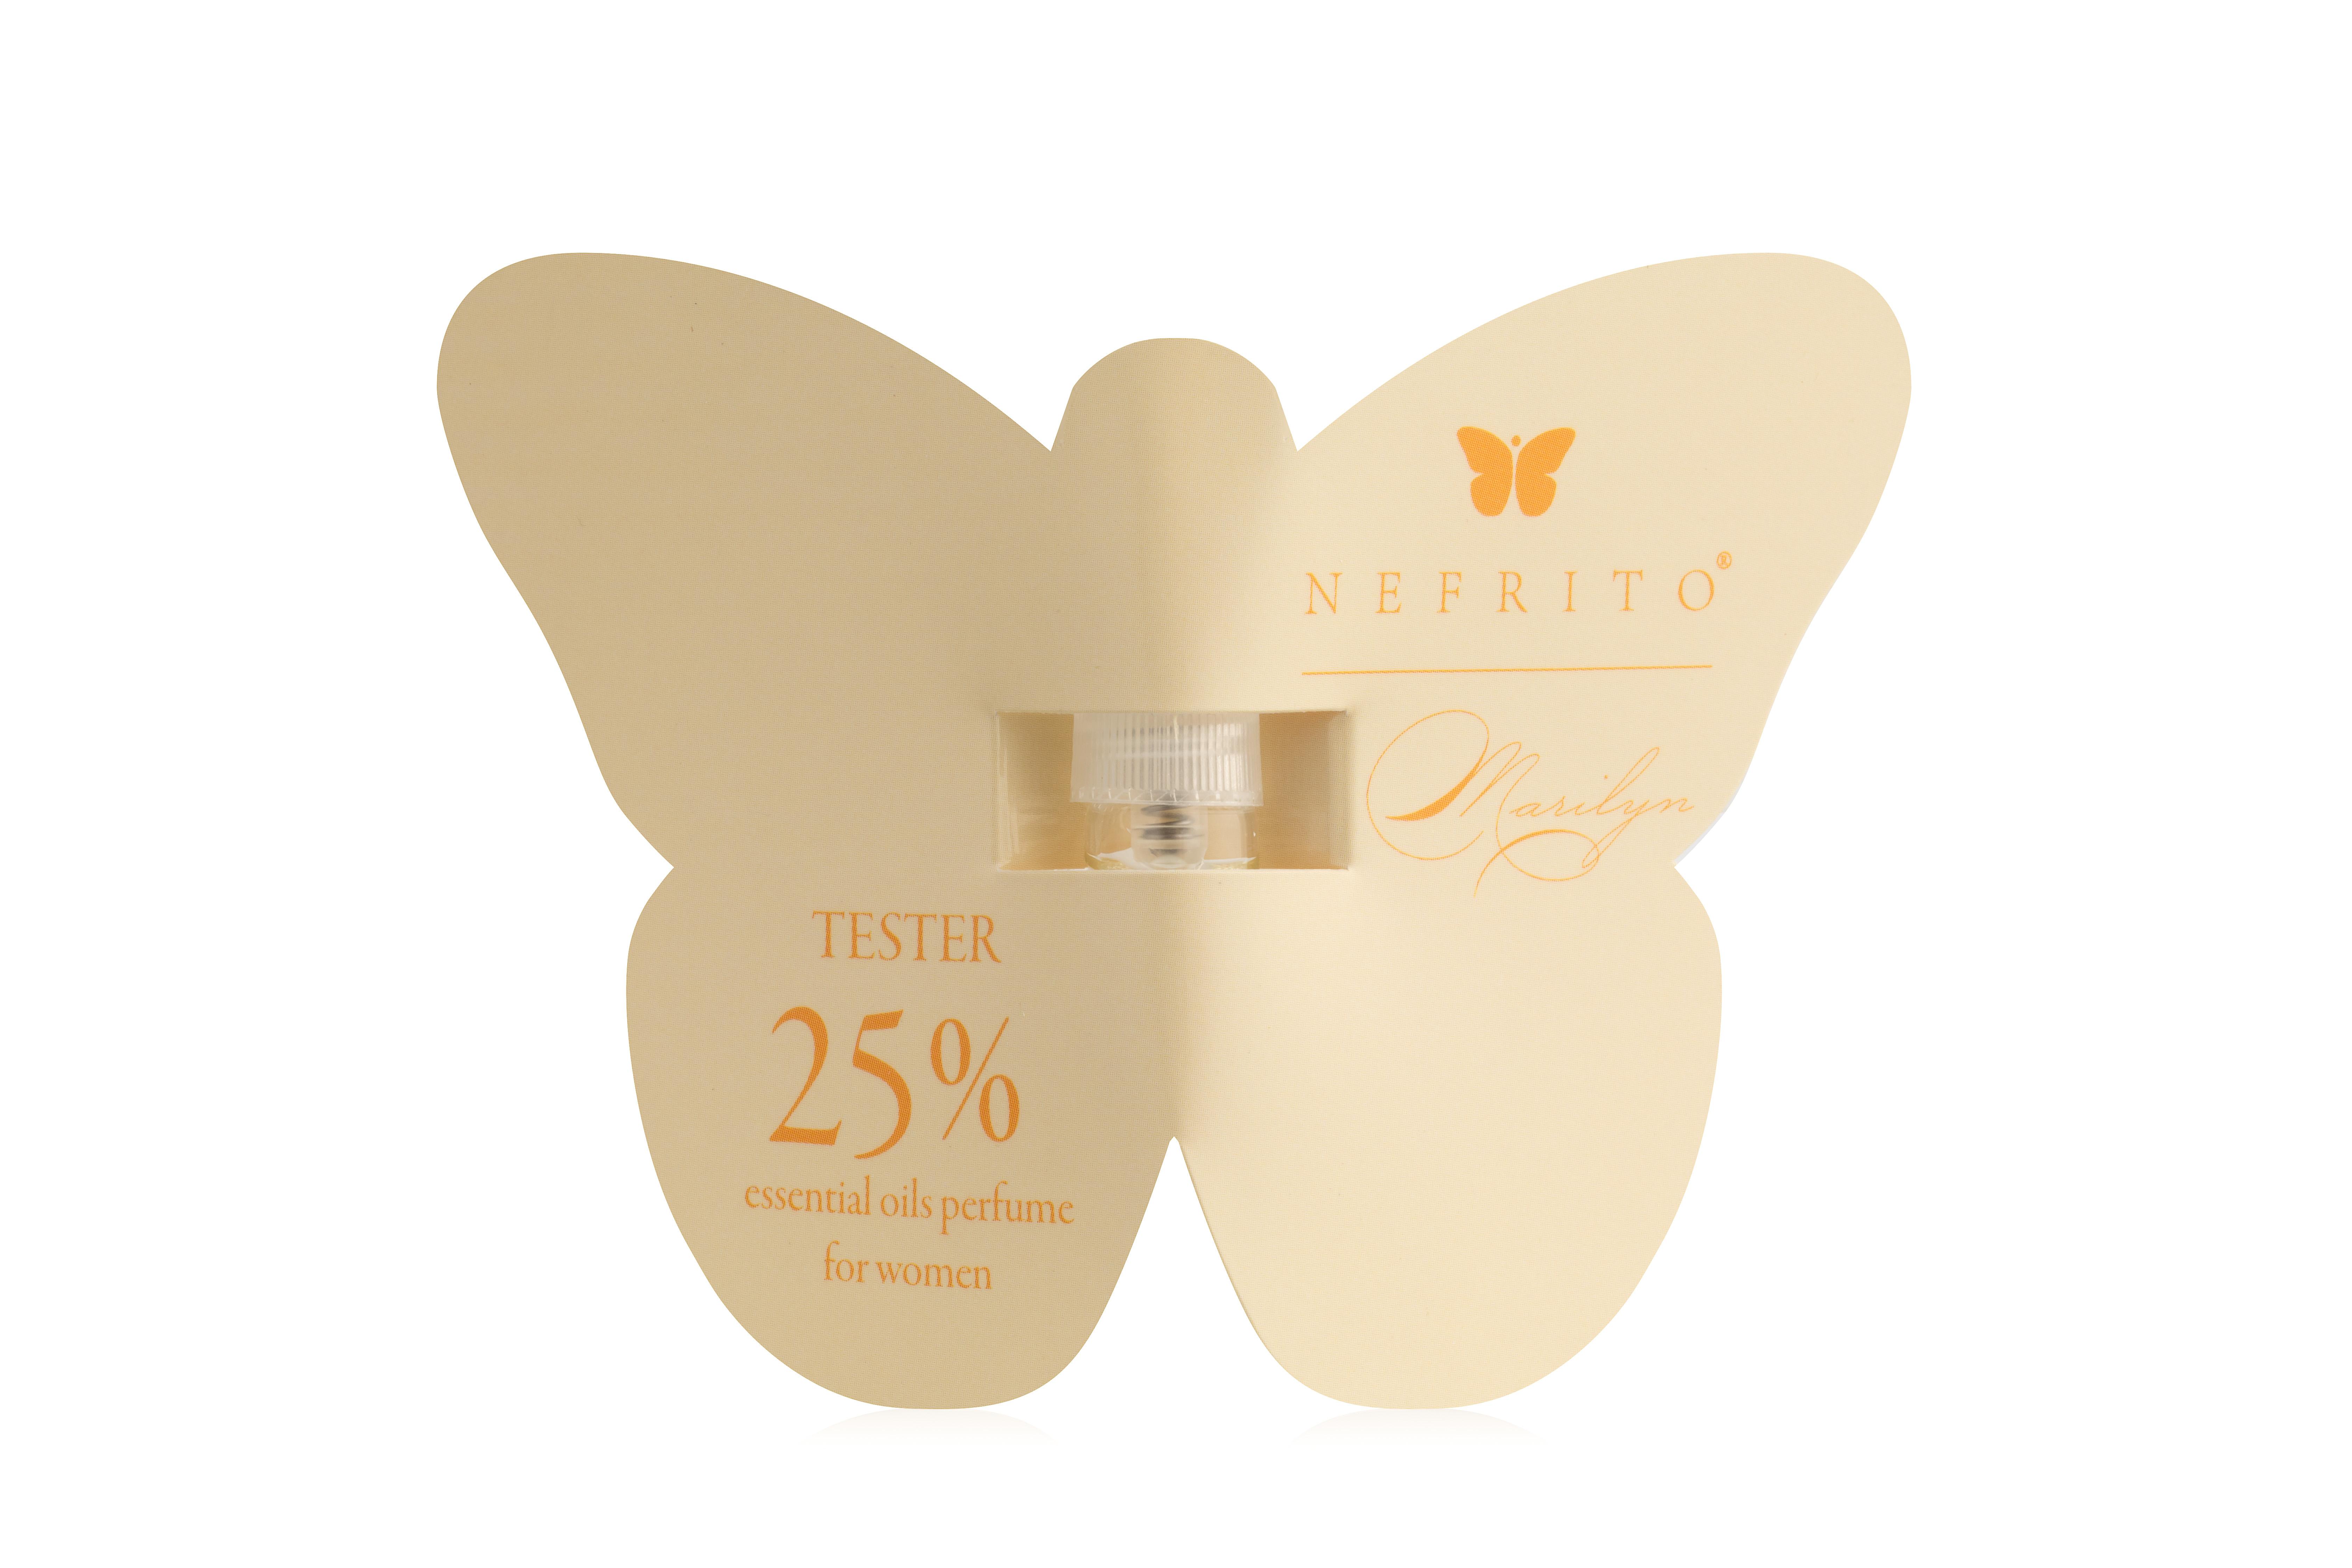 nefrito-butterfly-outside-marilyn